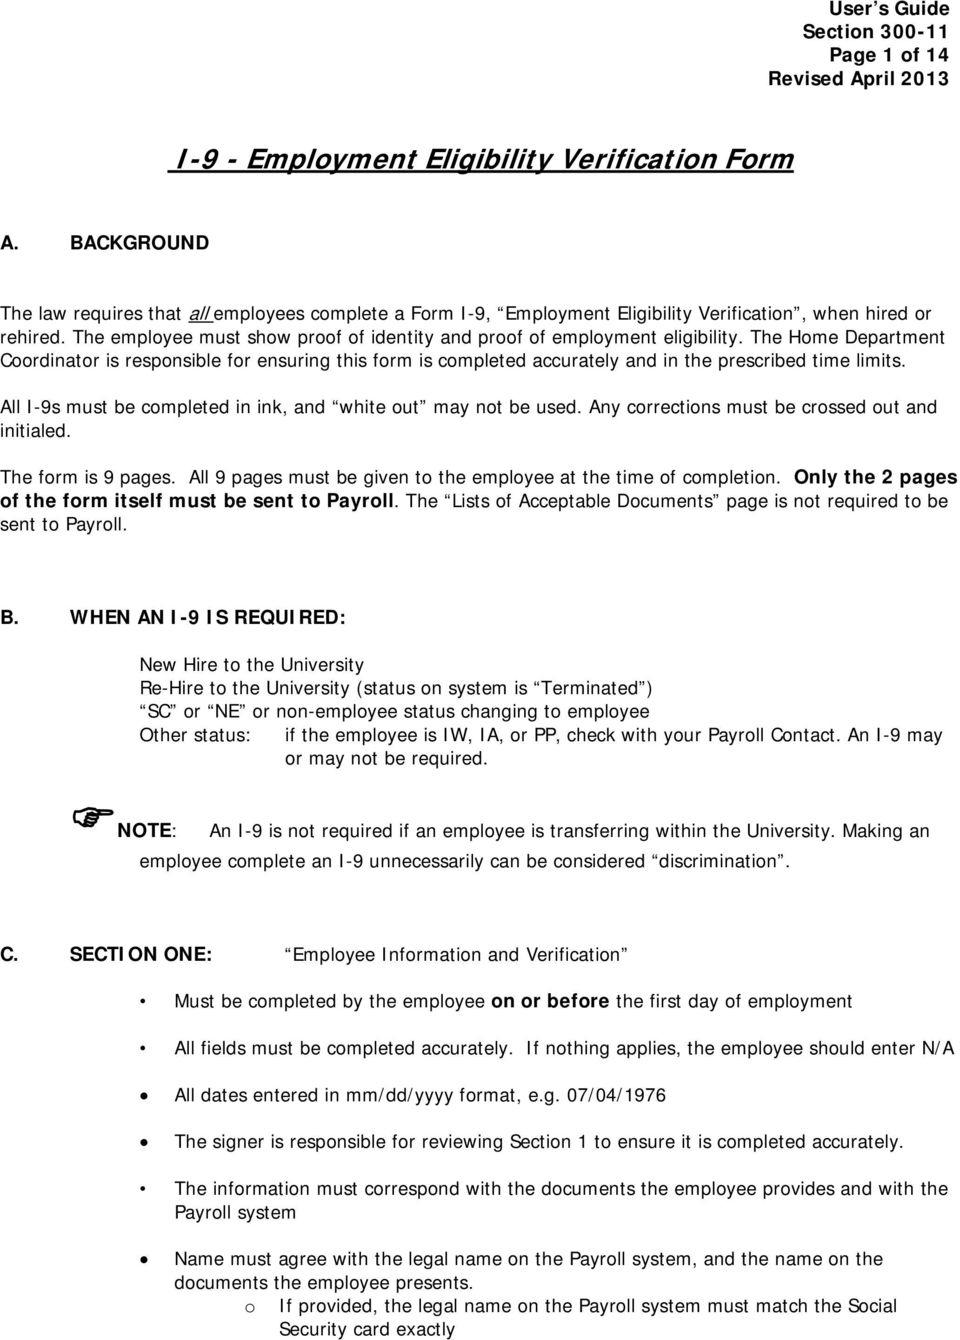 I-9 - Employment Eligibility Verification Form - Pdf